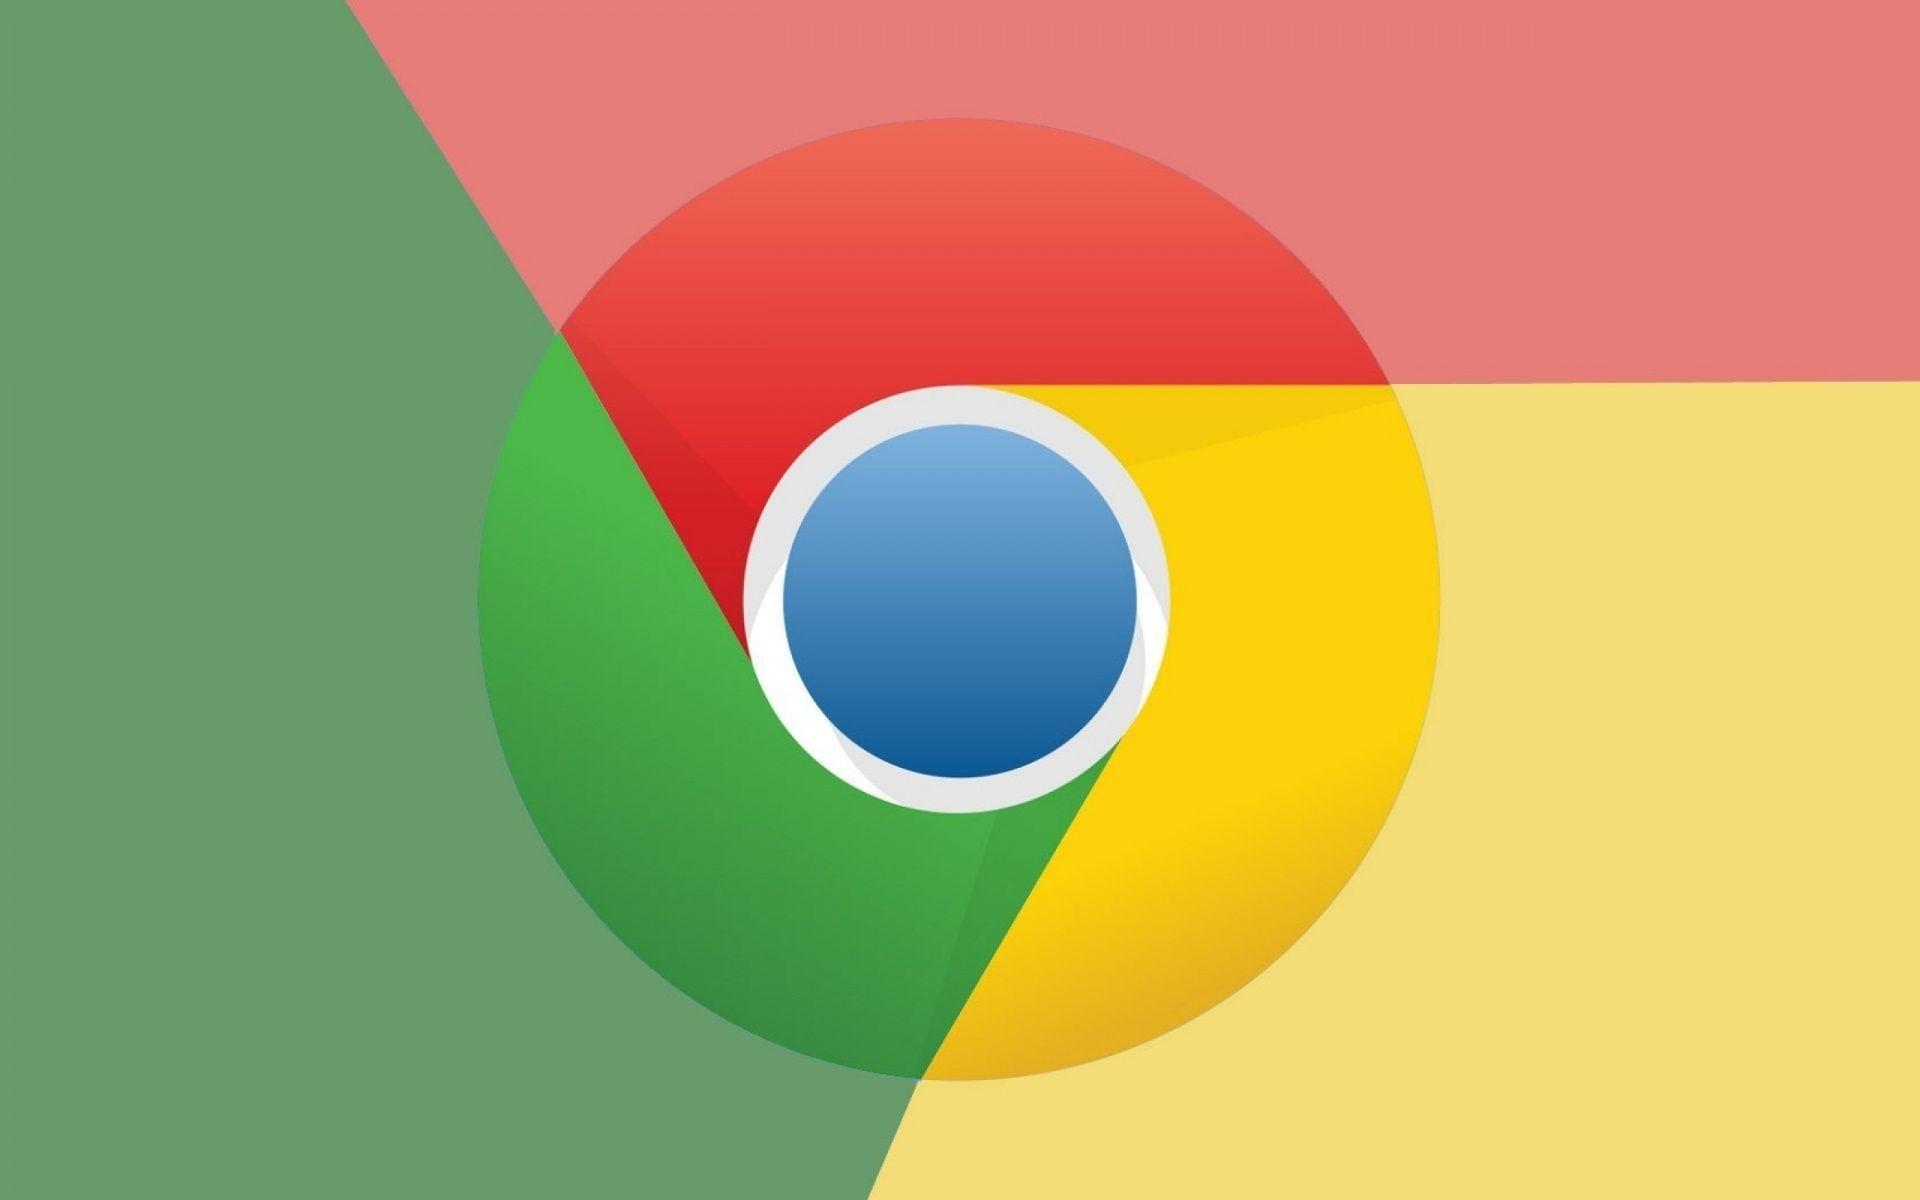 Google Chrome Wallpaper Backgrounds Wallpaper Cave